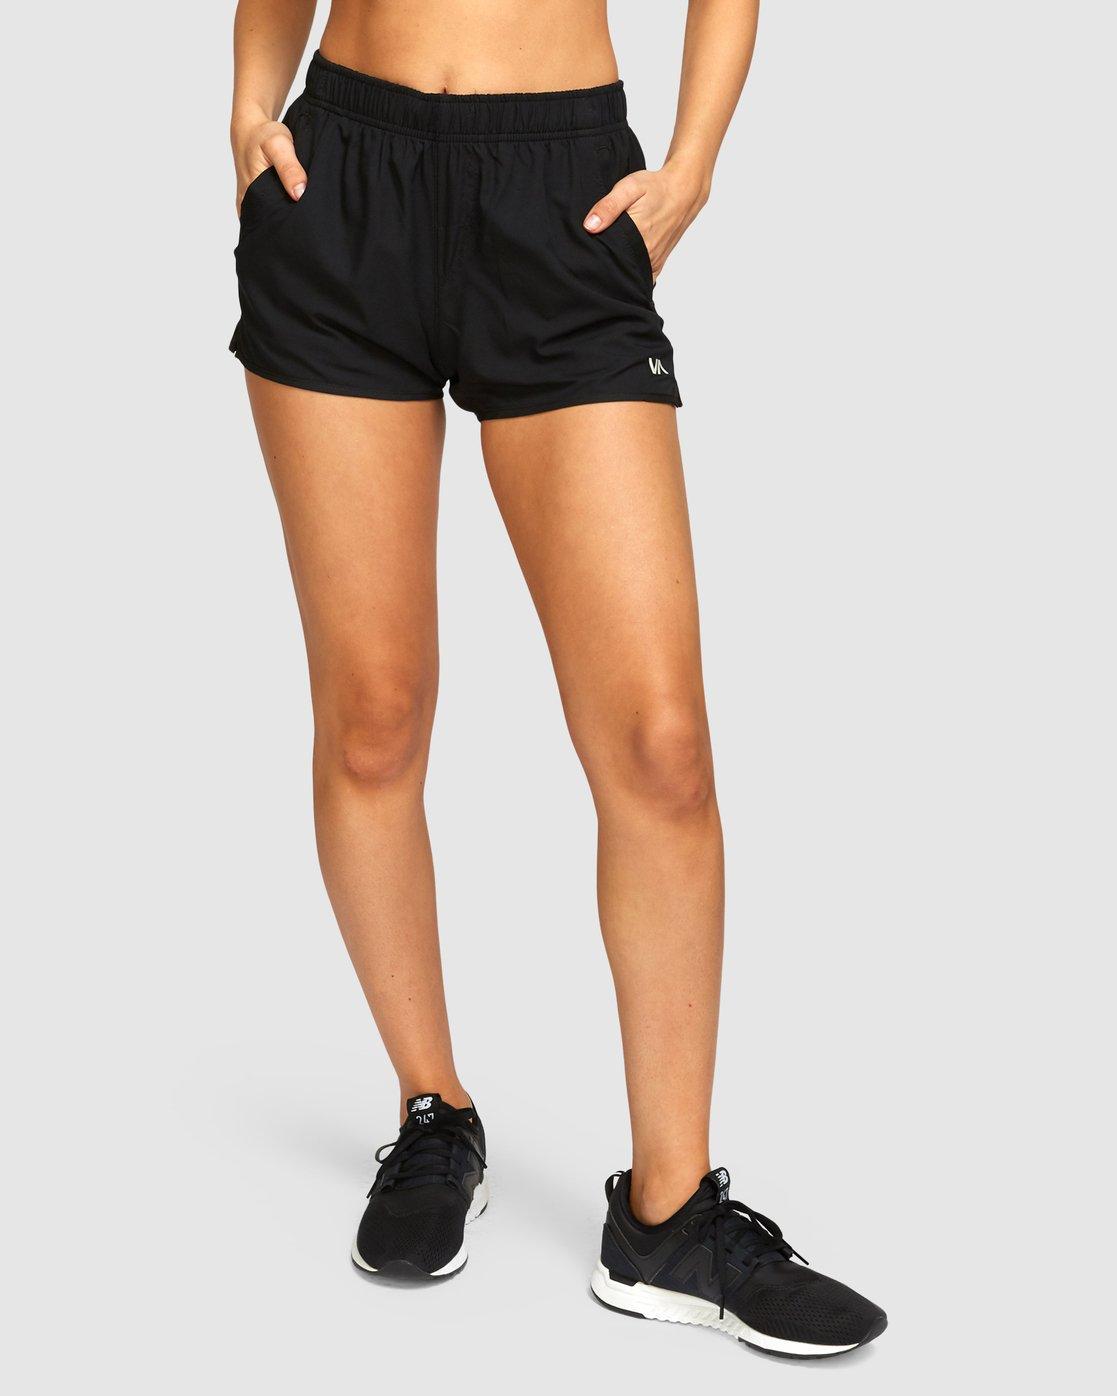 0 Womens Yogger Stretch Shorts Black R493313 RVCA